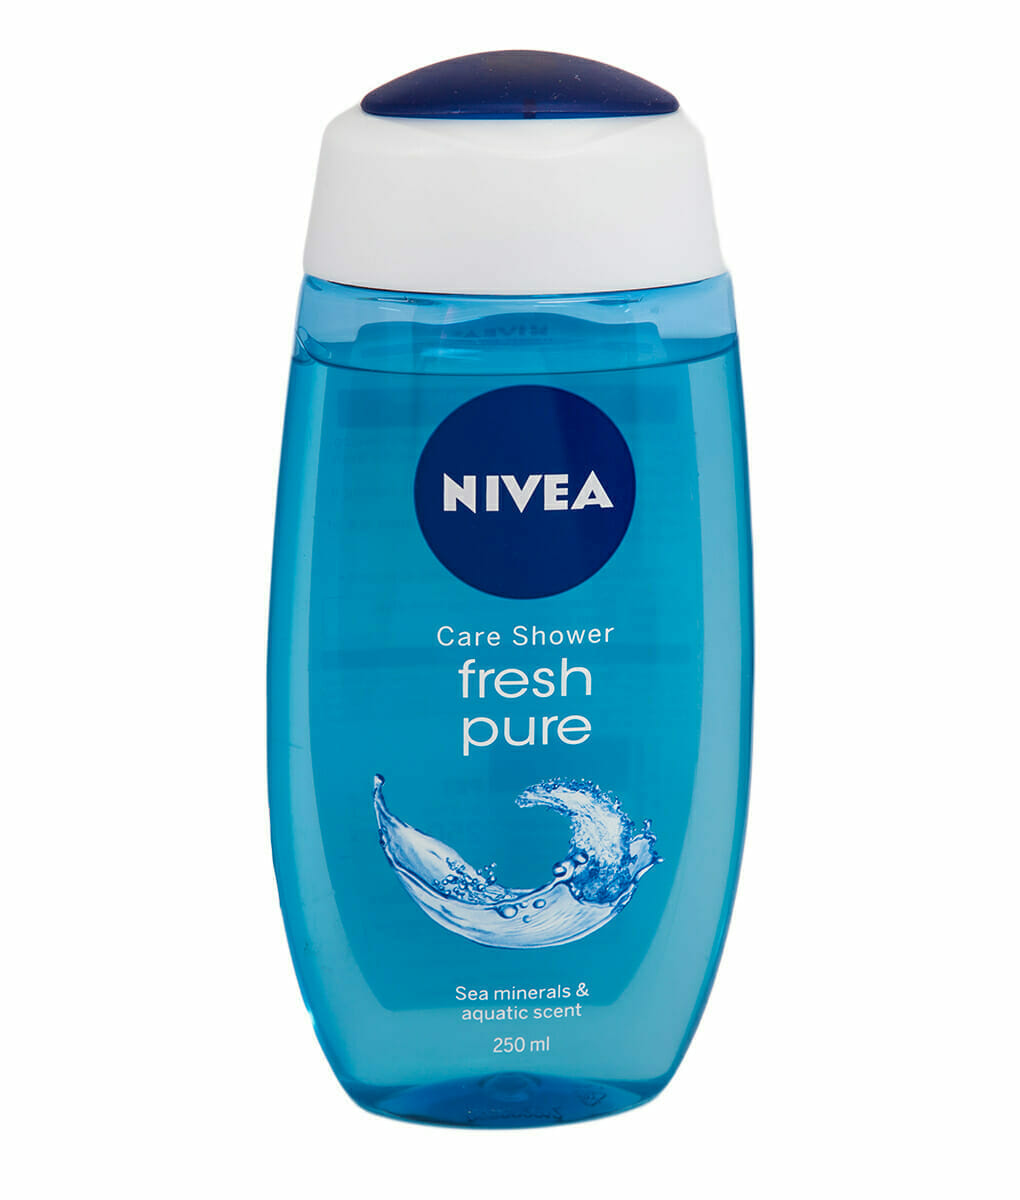 Nivea Care Shower Fresh Pure Body Wash 250ml | Kasha Kenya